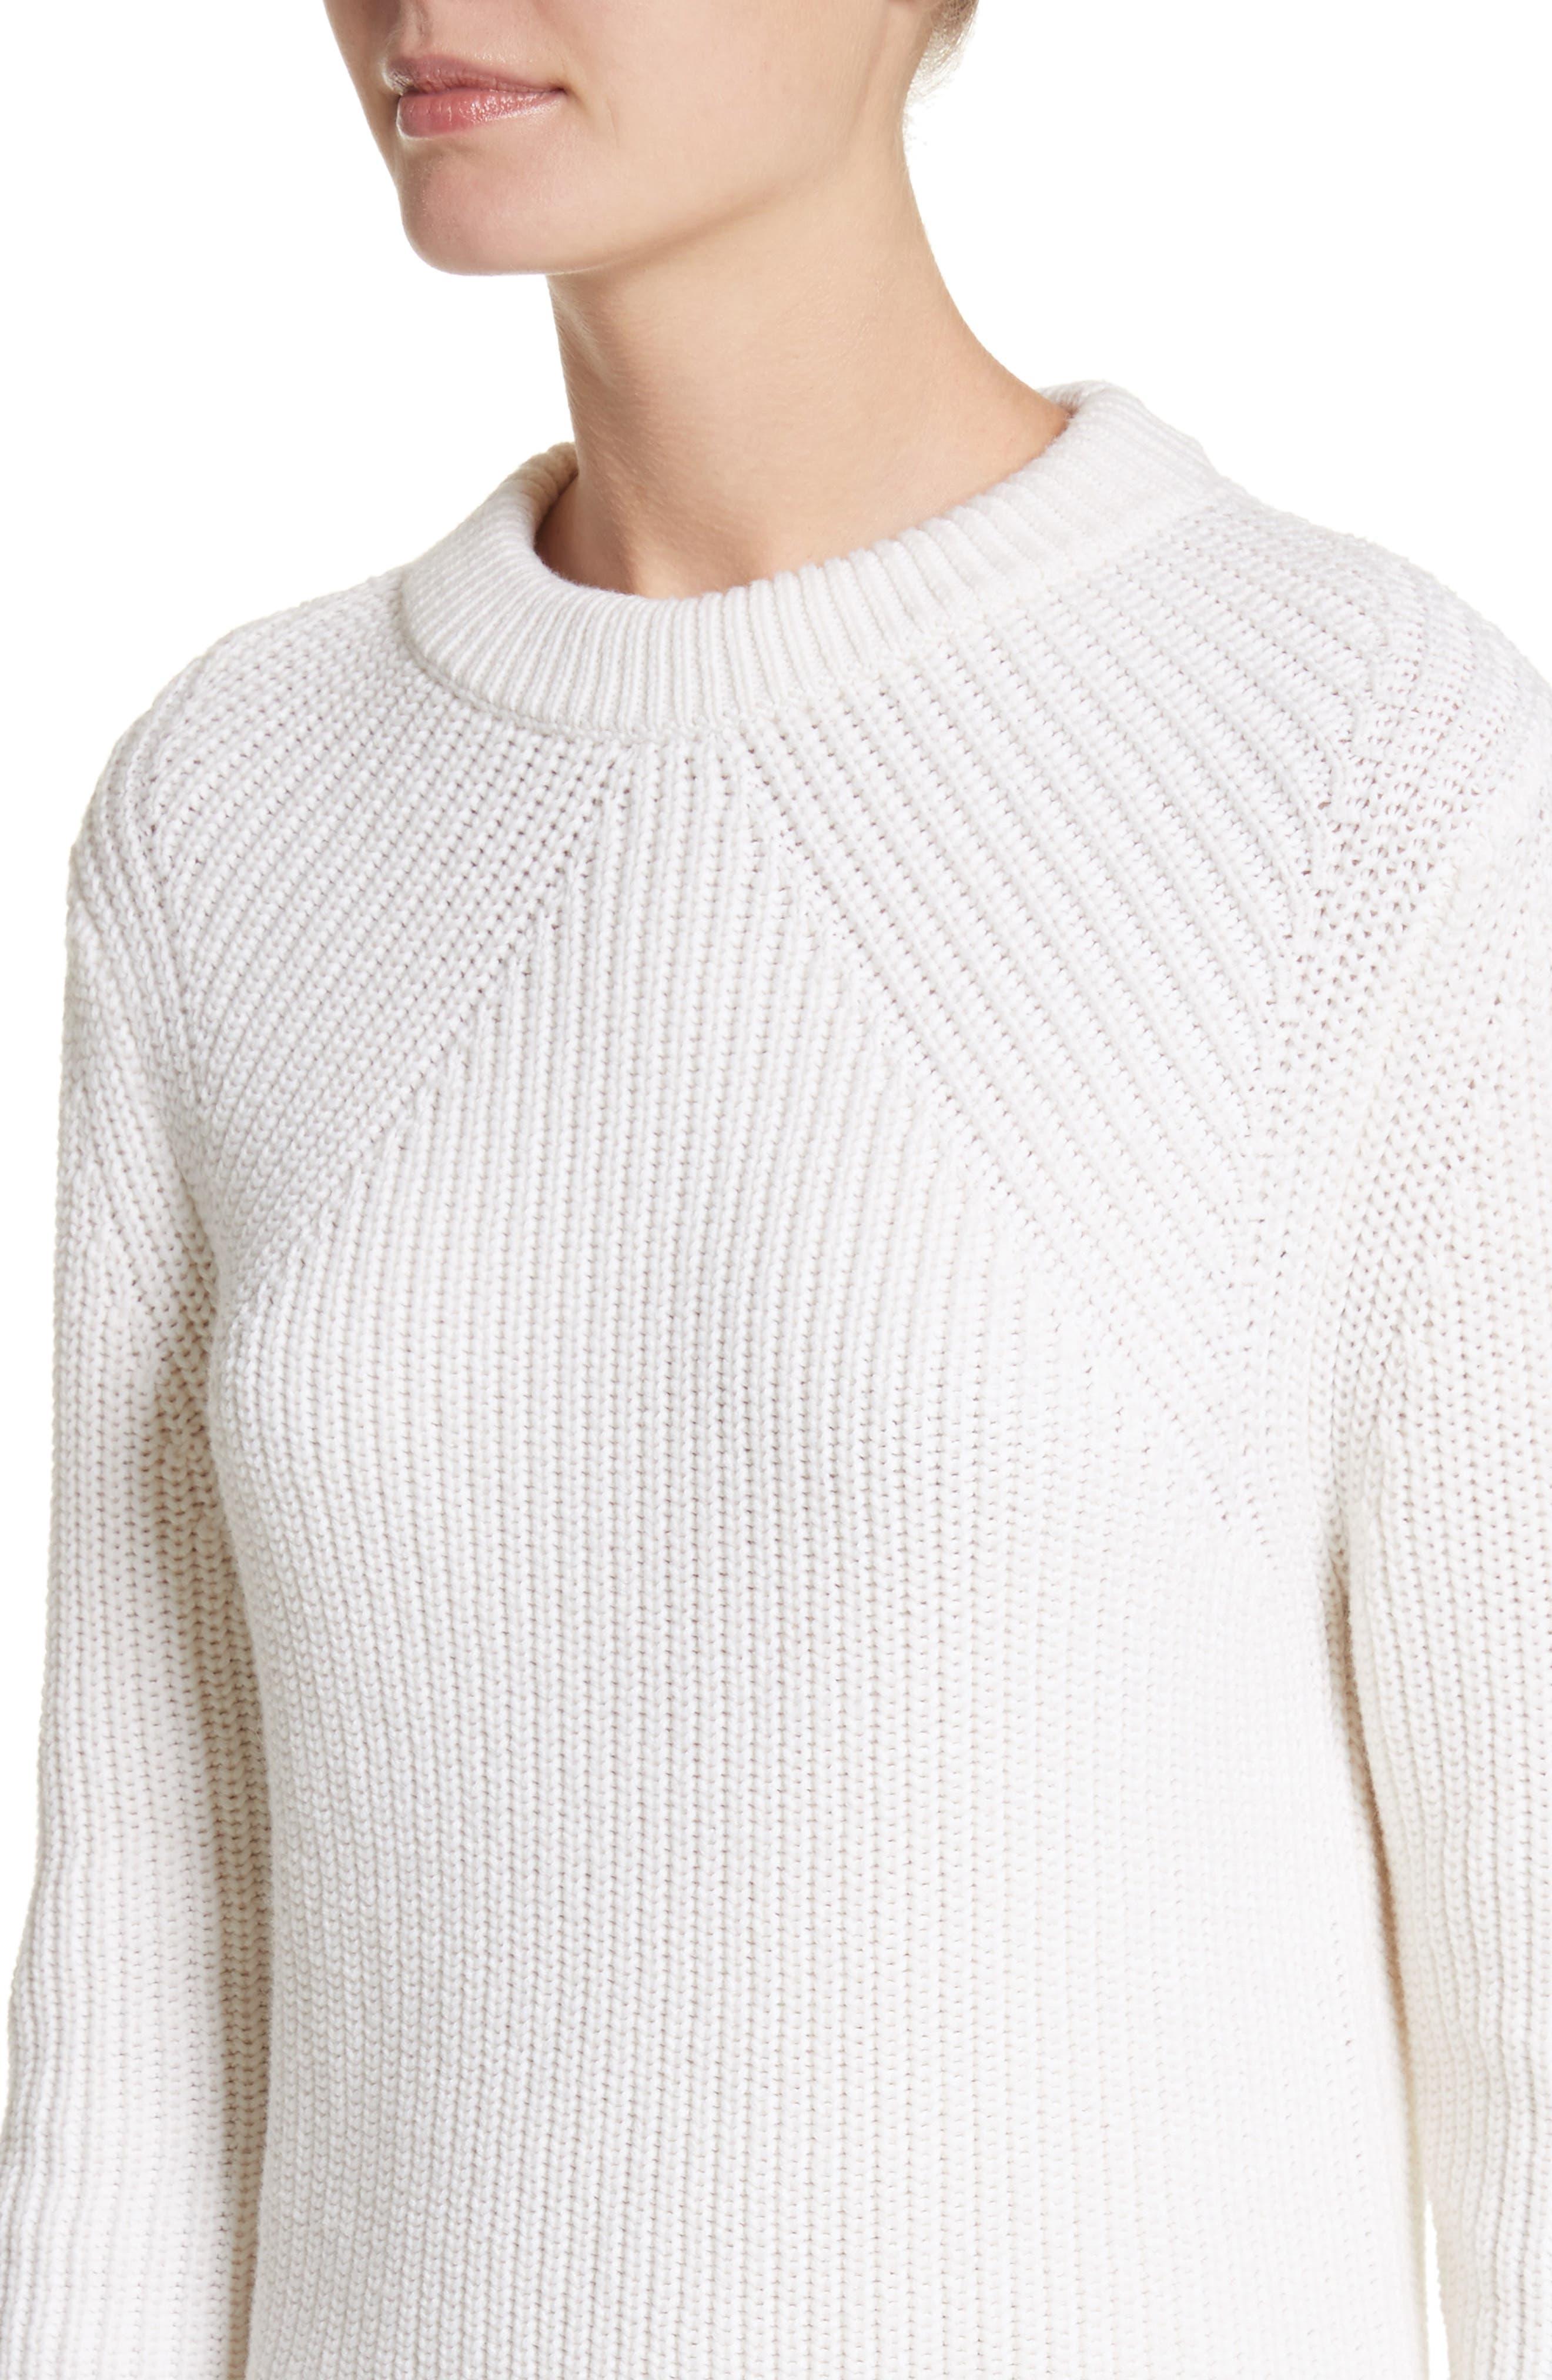 Alternate Image 4  - Michael Kors Merino Wool & Cotton Pullover